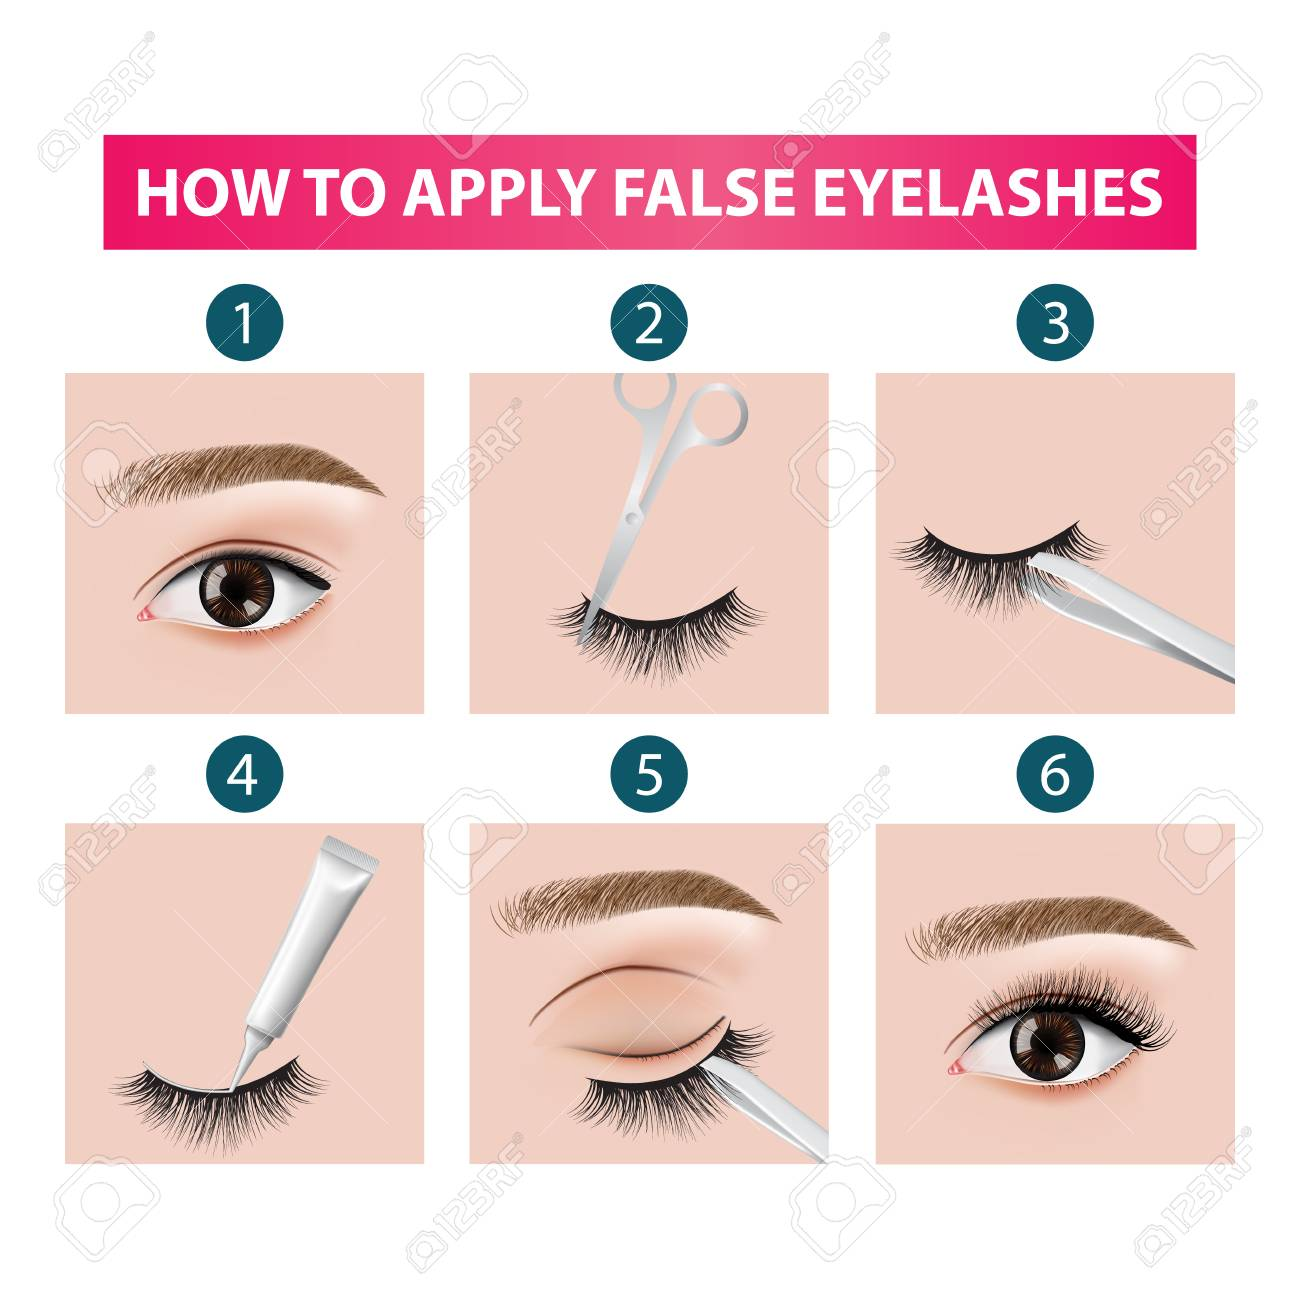 How to apply false eyelashes vector illustration - 113127783